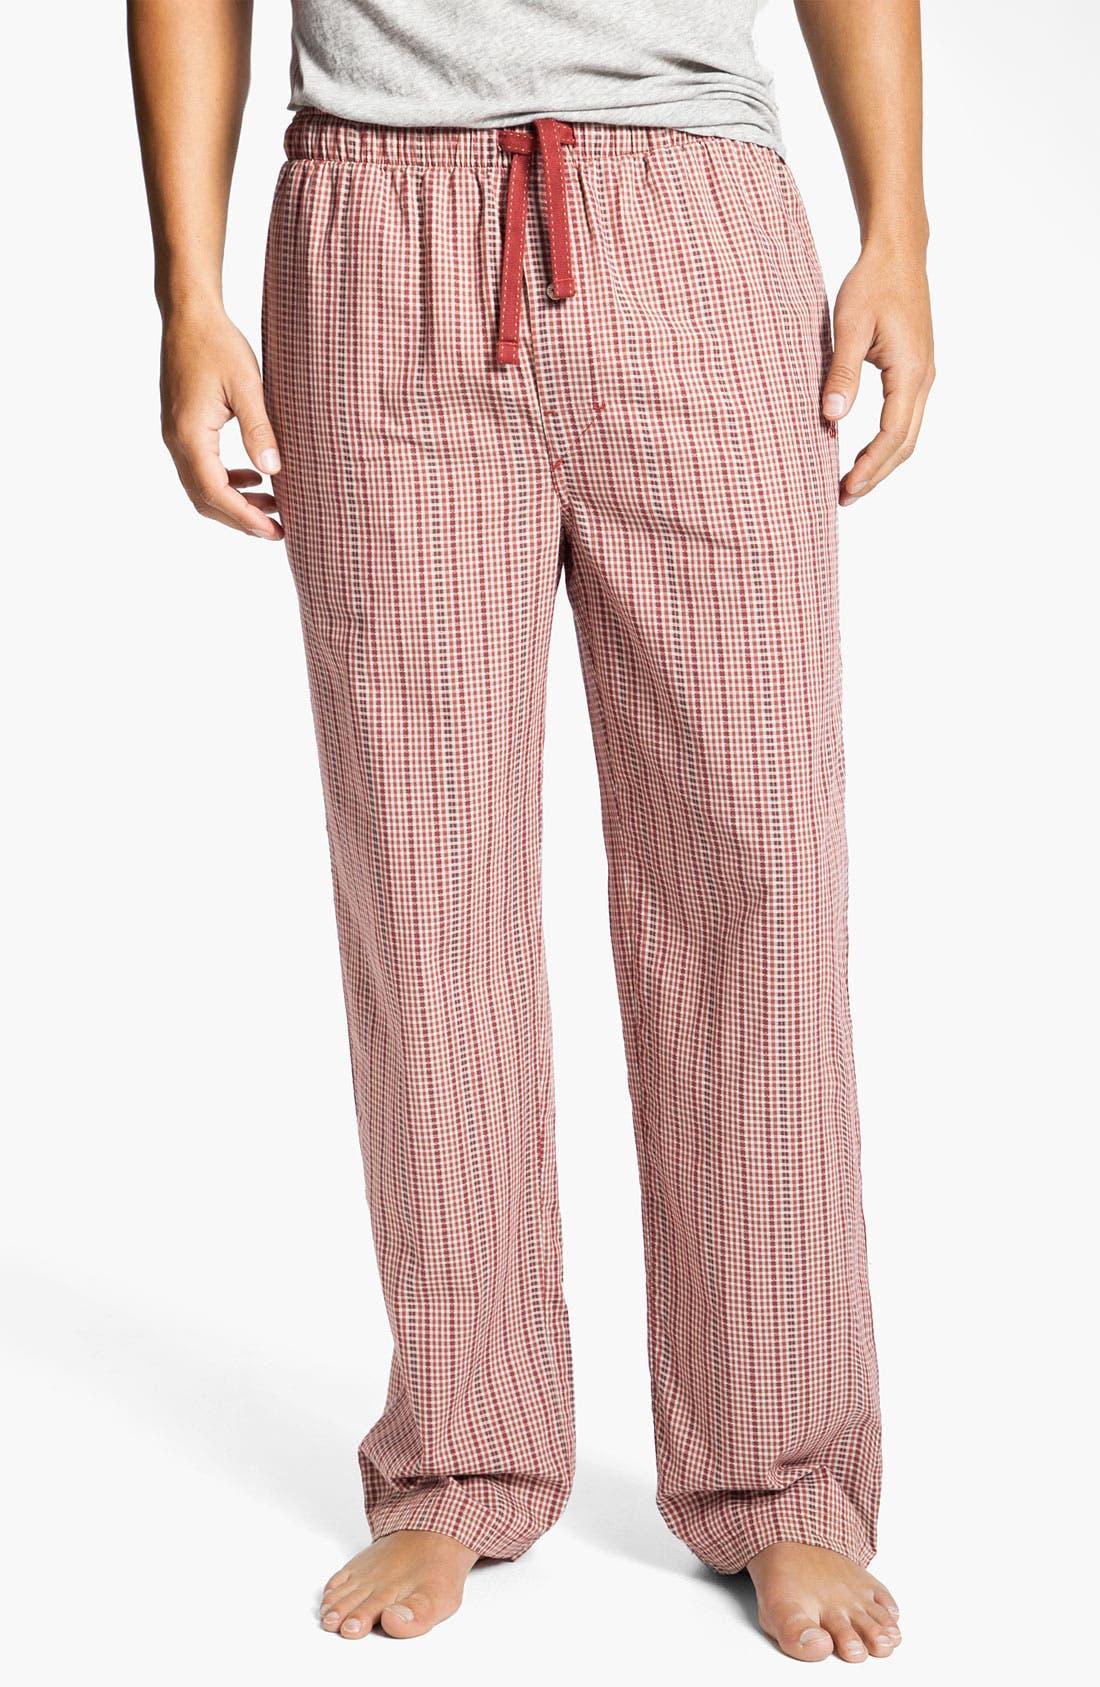 Alternate Image 1 Selected - Tommy Bahama Stripe Lounge Pants